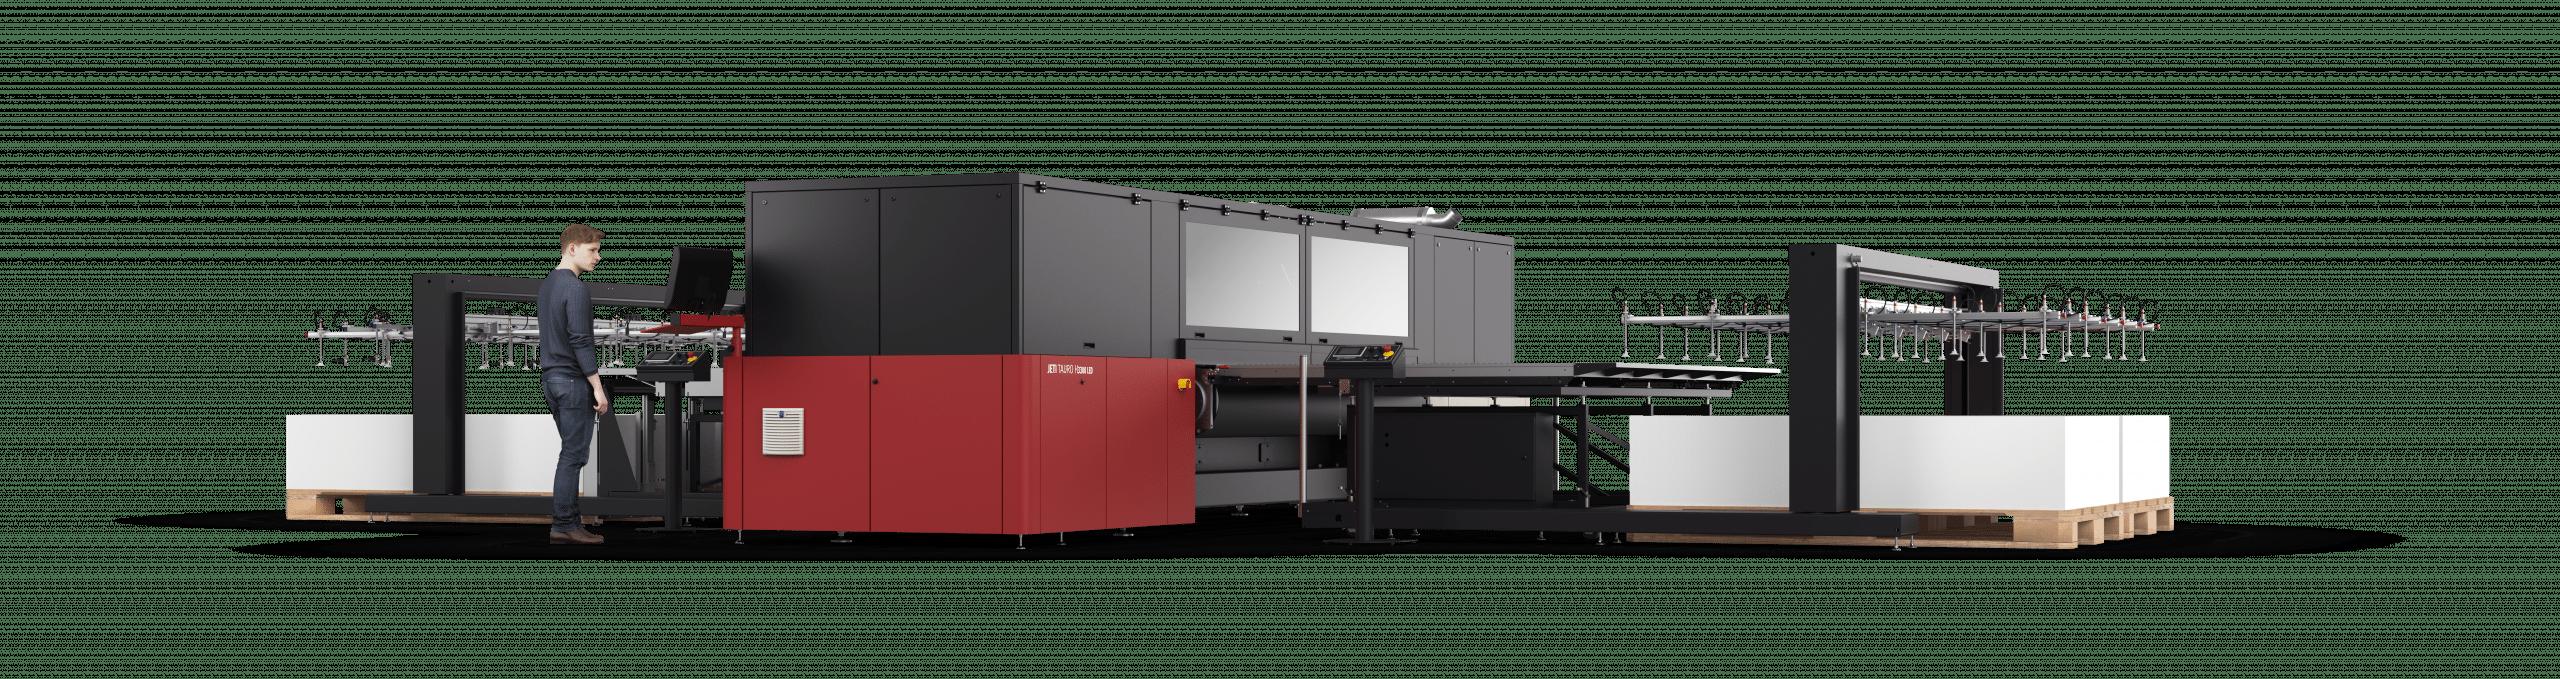 Jeti Tauro H3300 Full Automation